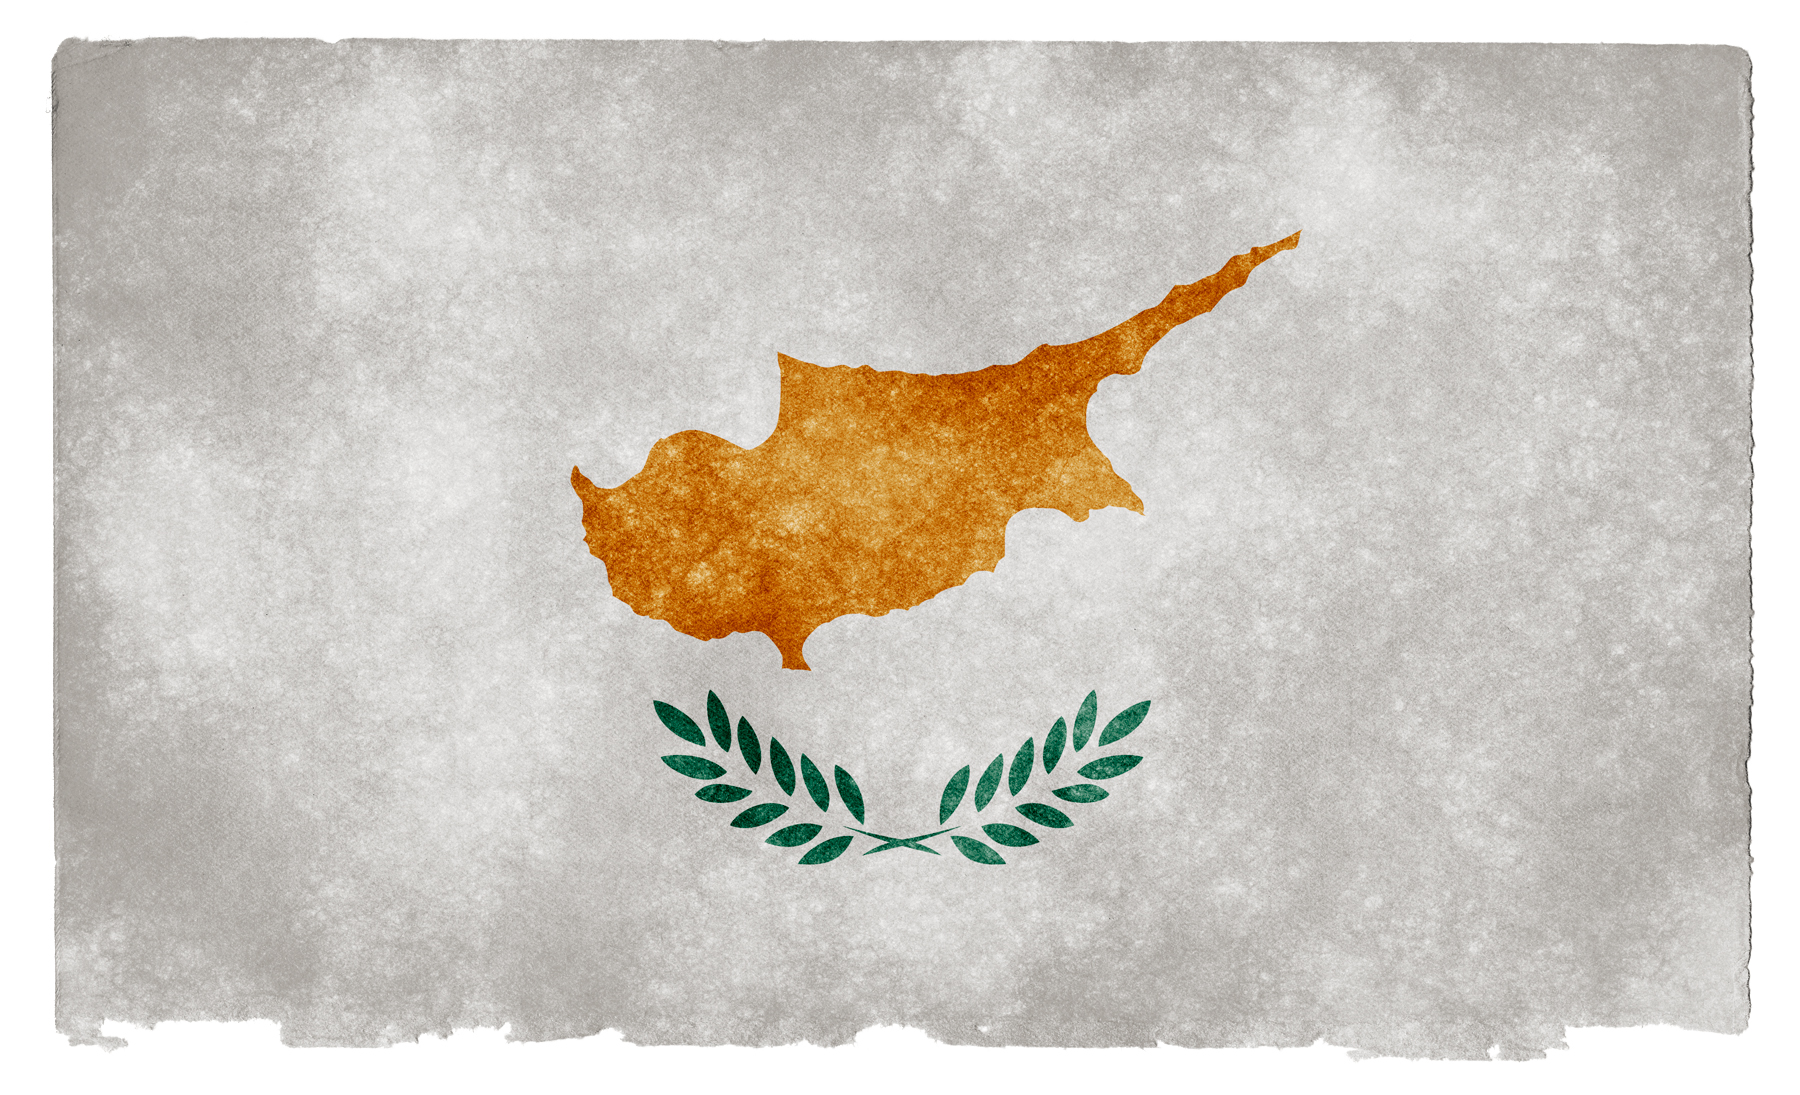 Chypre, Κύπρος, Kıbrıs, Cyprus